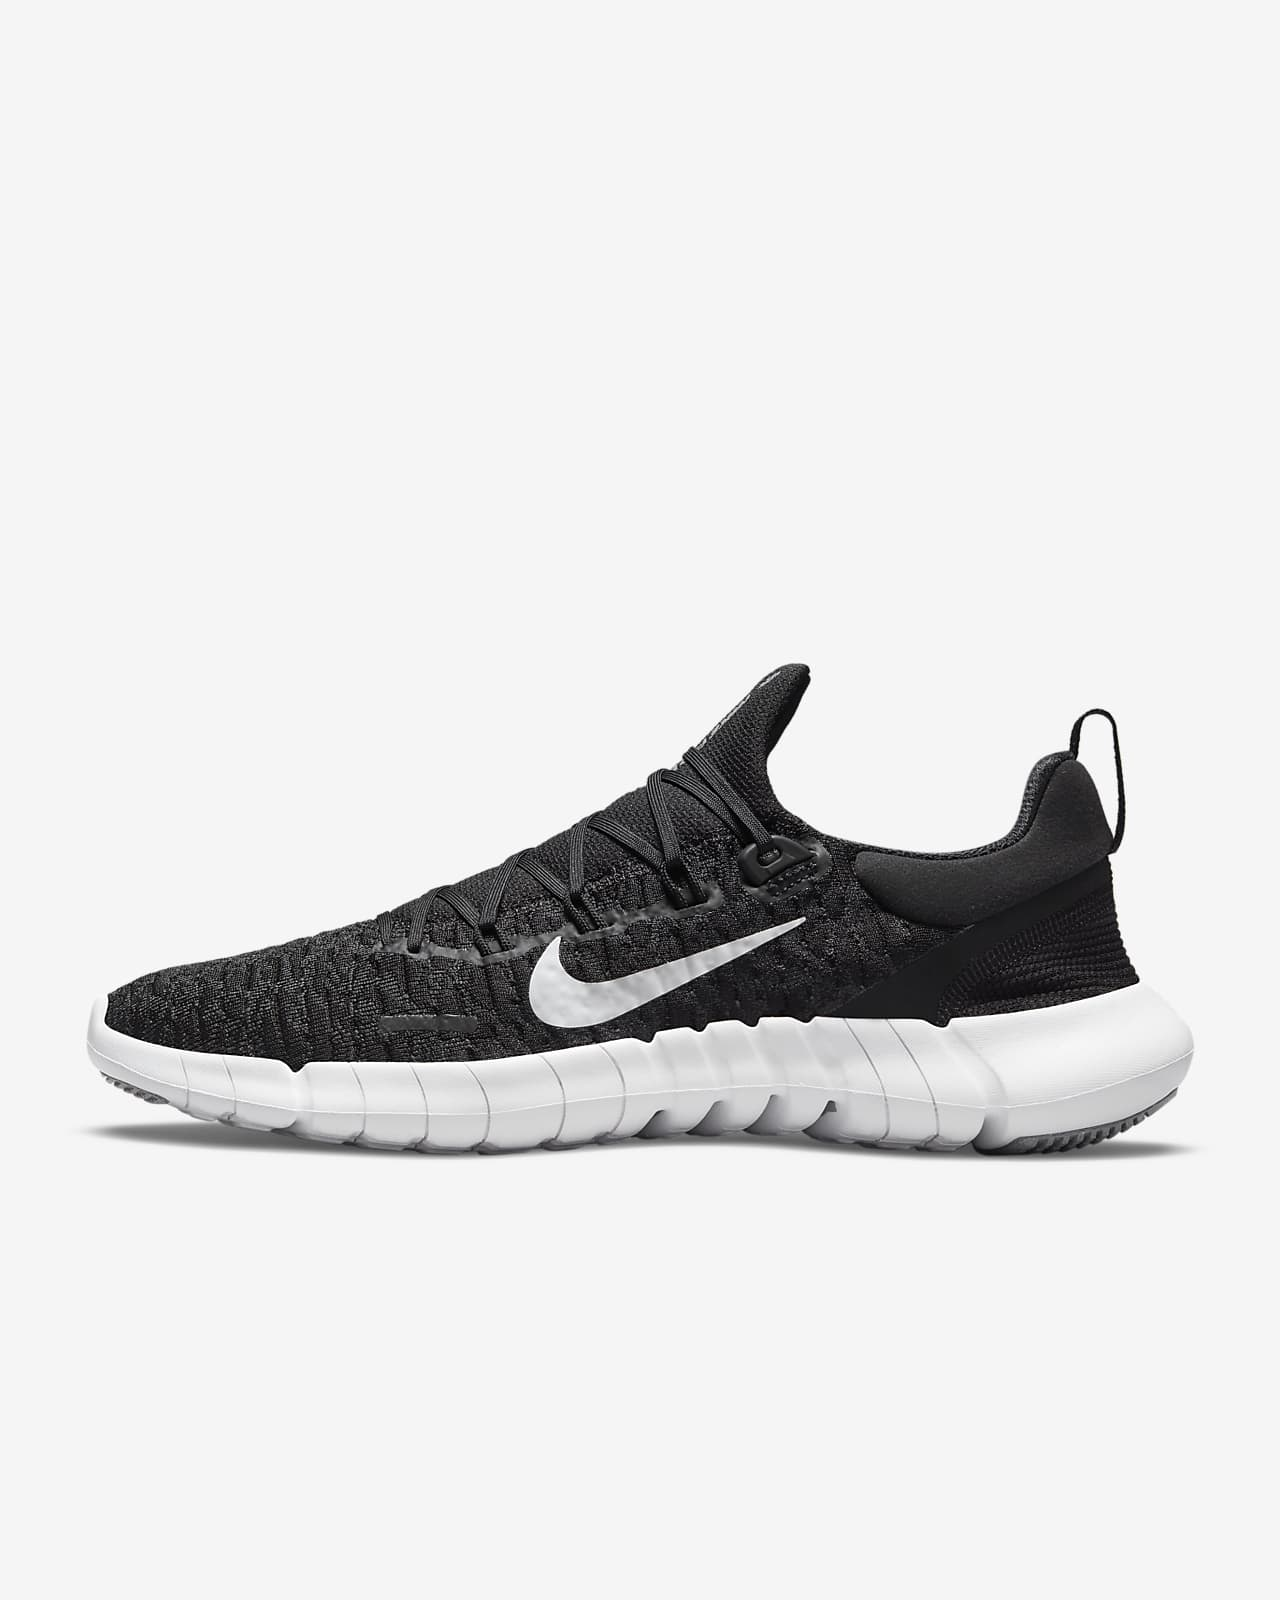 Chaussure de running sur route Nike Free Run5.0 pour Femme